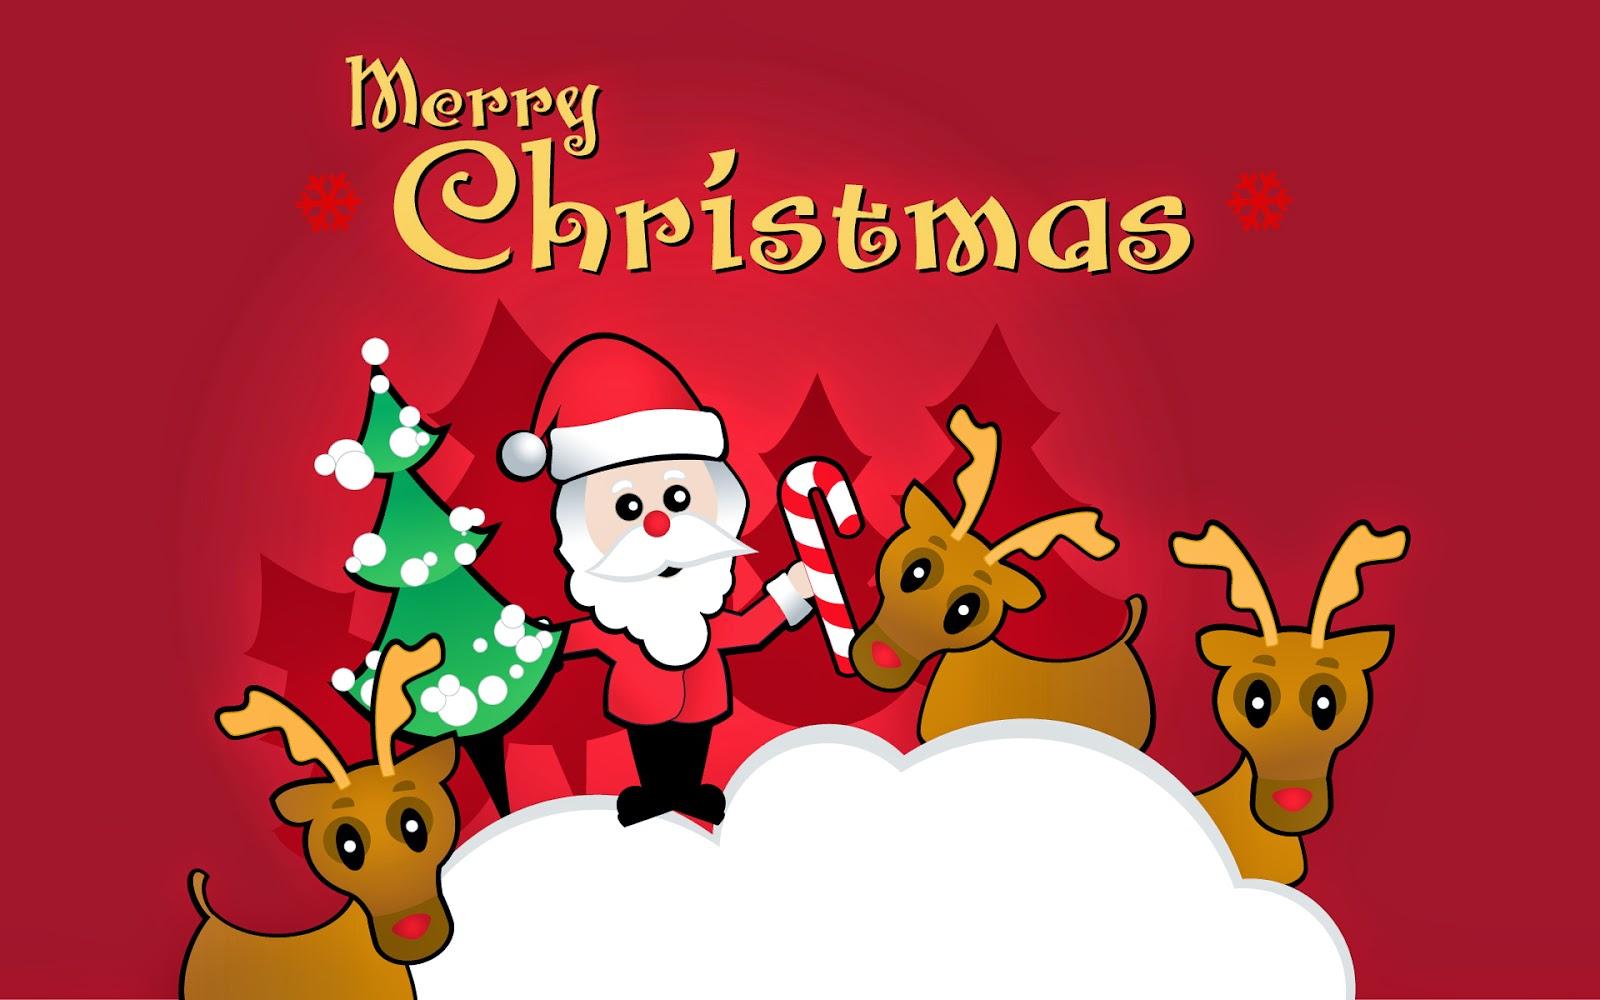 Merry-Christmas-text-santa-wallpaper-HD-free-download.jpg